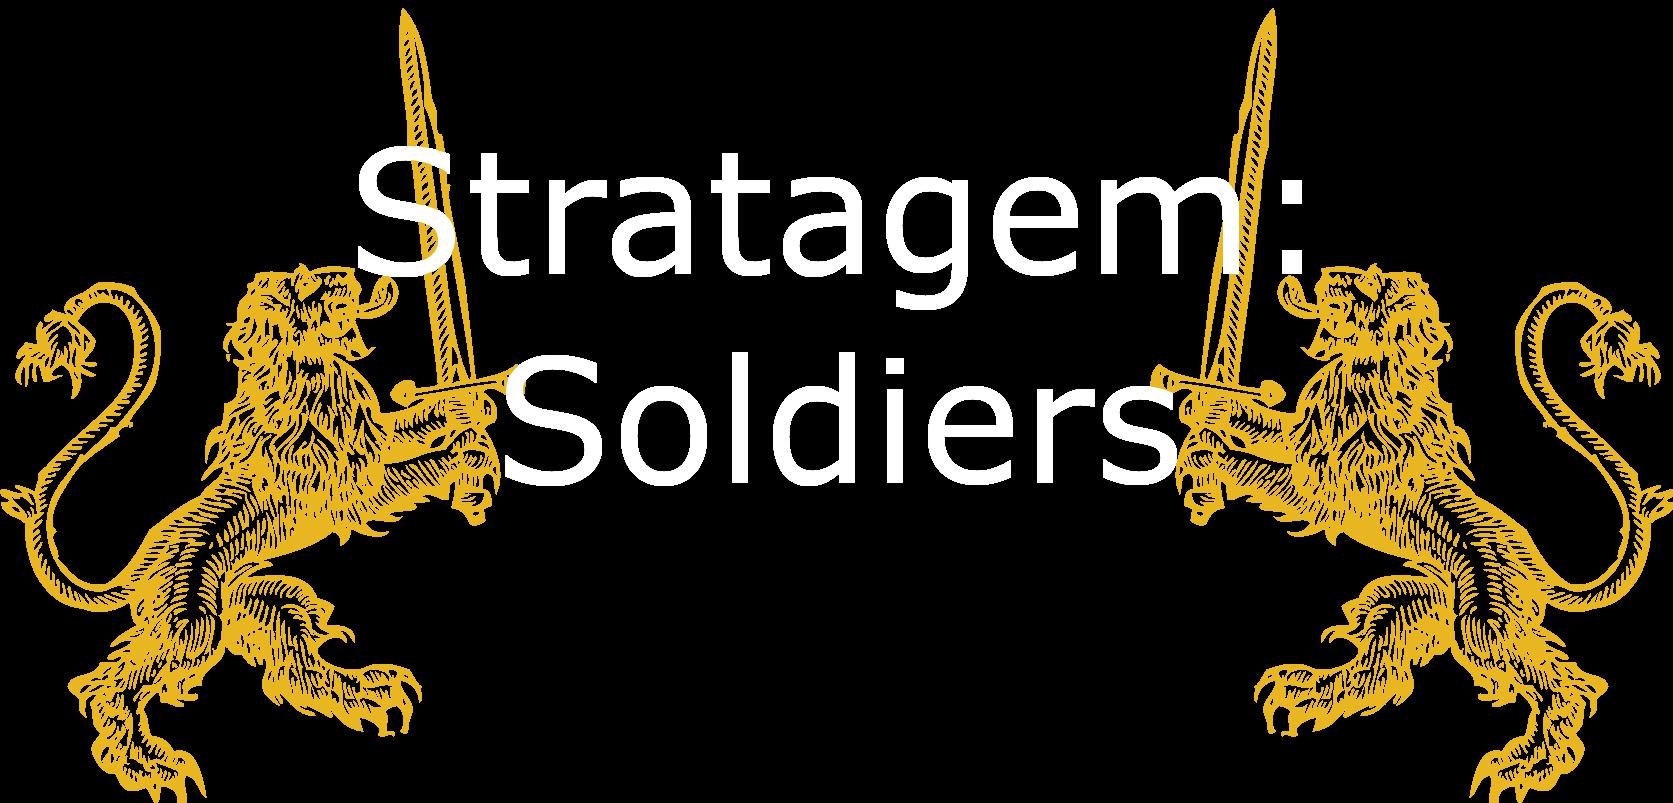 Stratagem: Soldiers